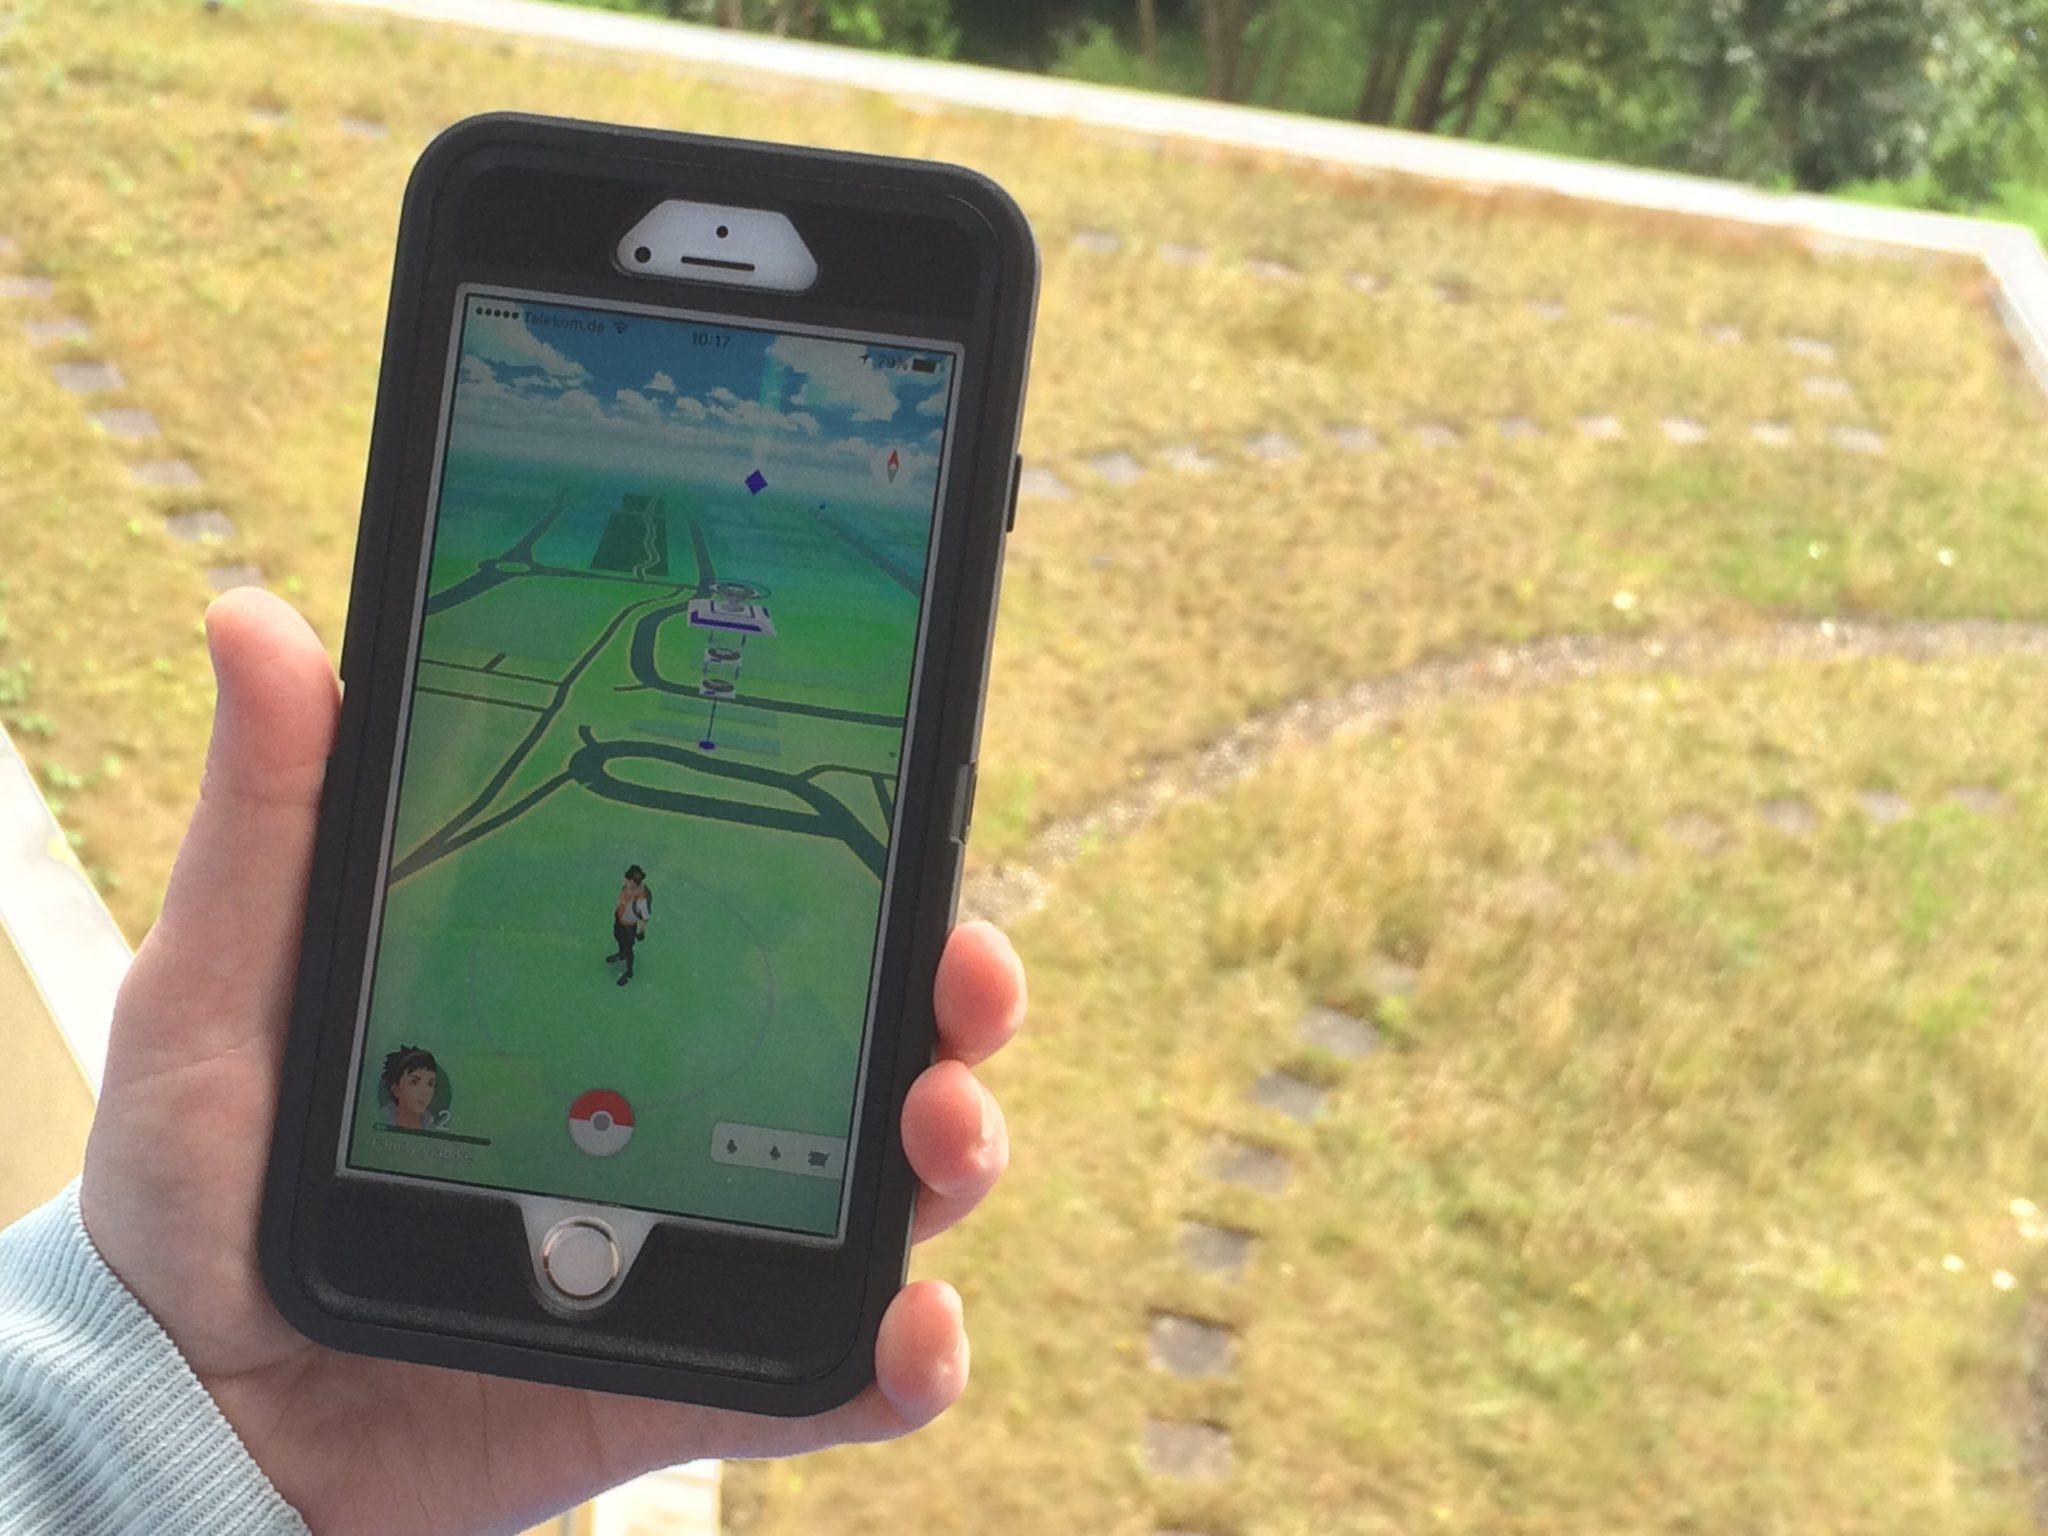 Outside with PokemonGO - that's good isn't it?